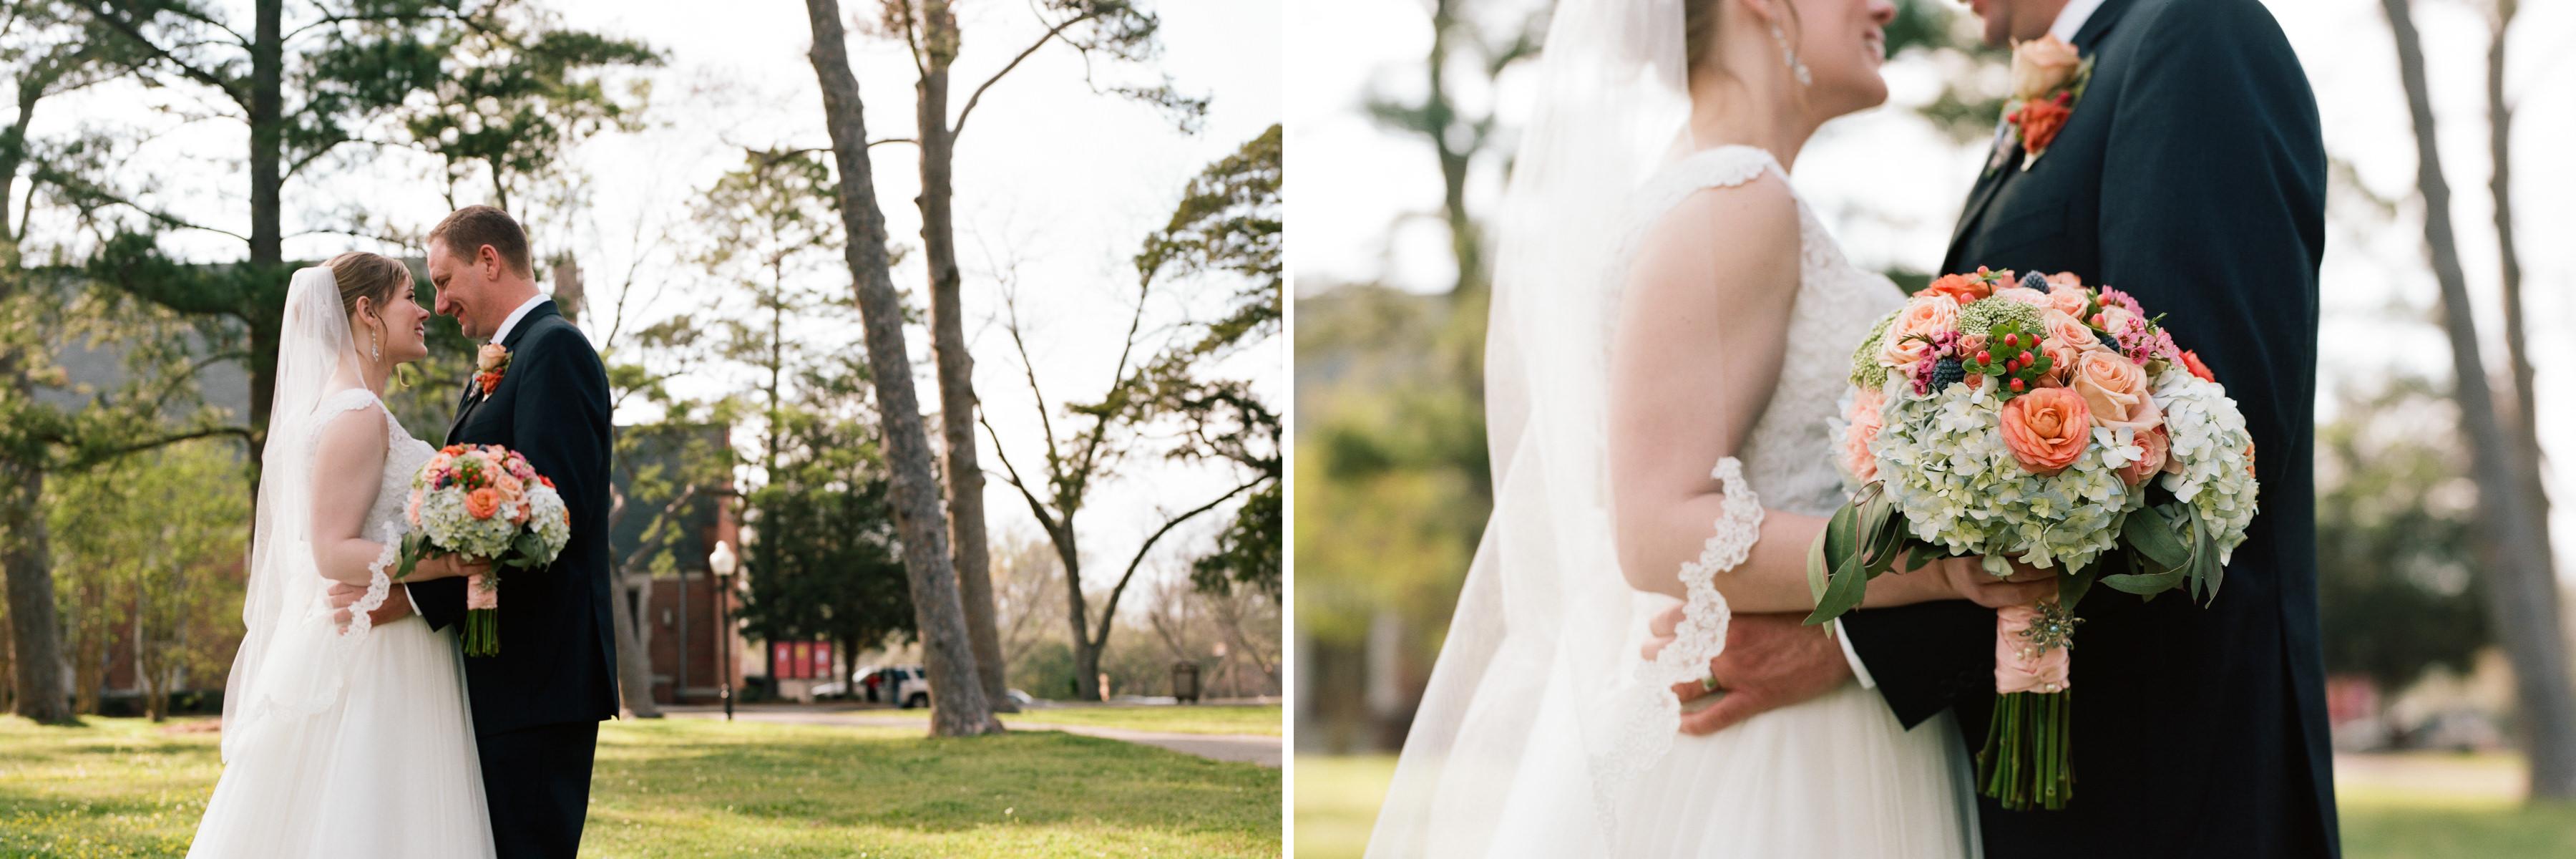 MAULDIN_WEDDING_MONTGOMERY_ALABAMA_WEDDING_PHOTOGRAPHY_77